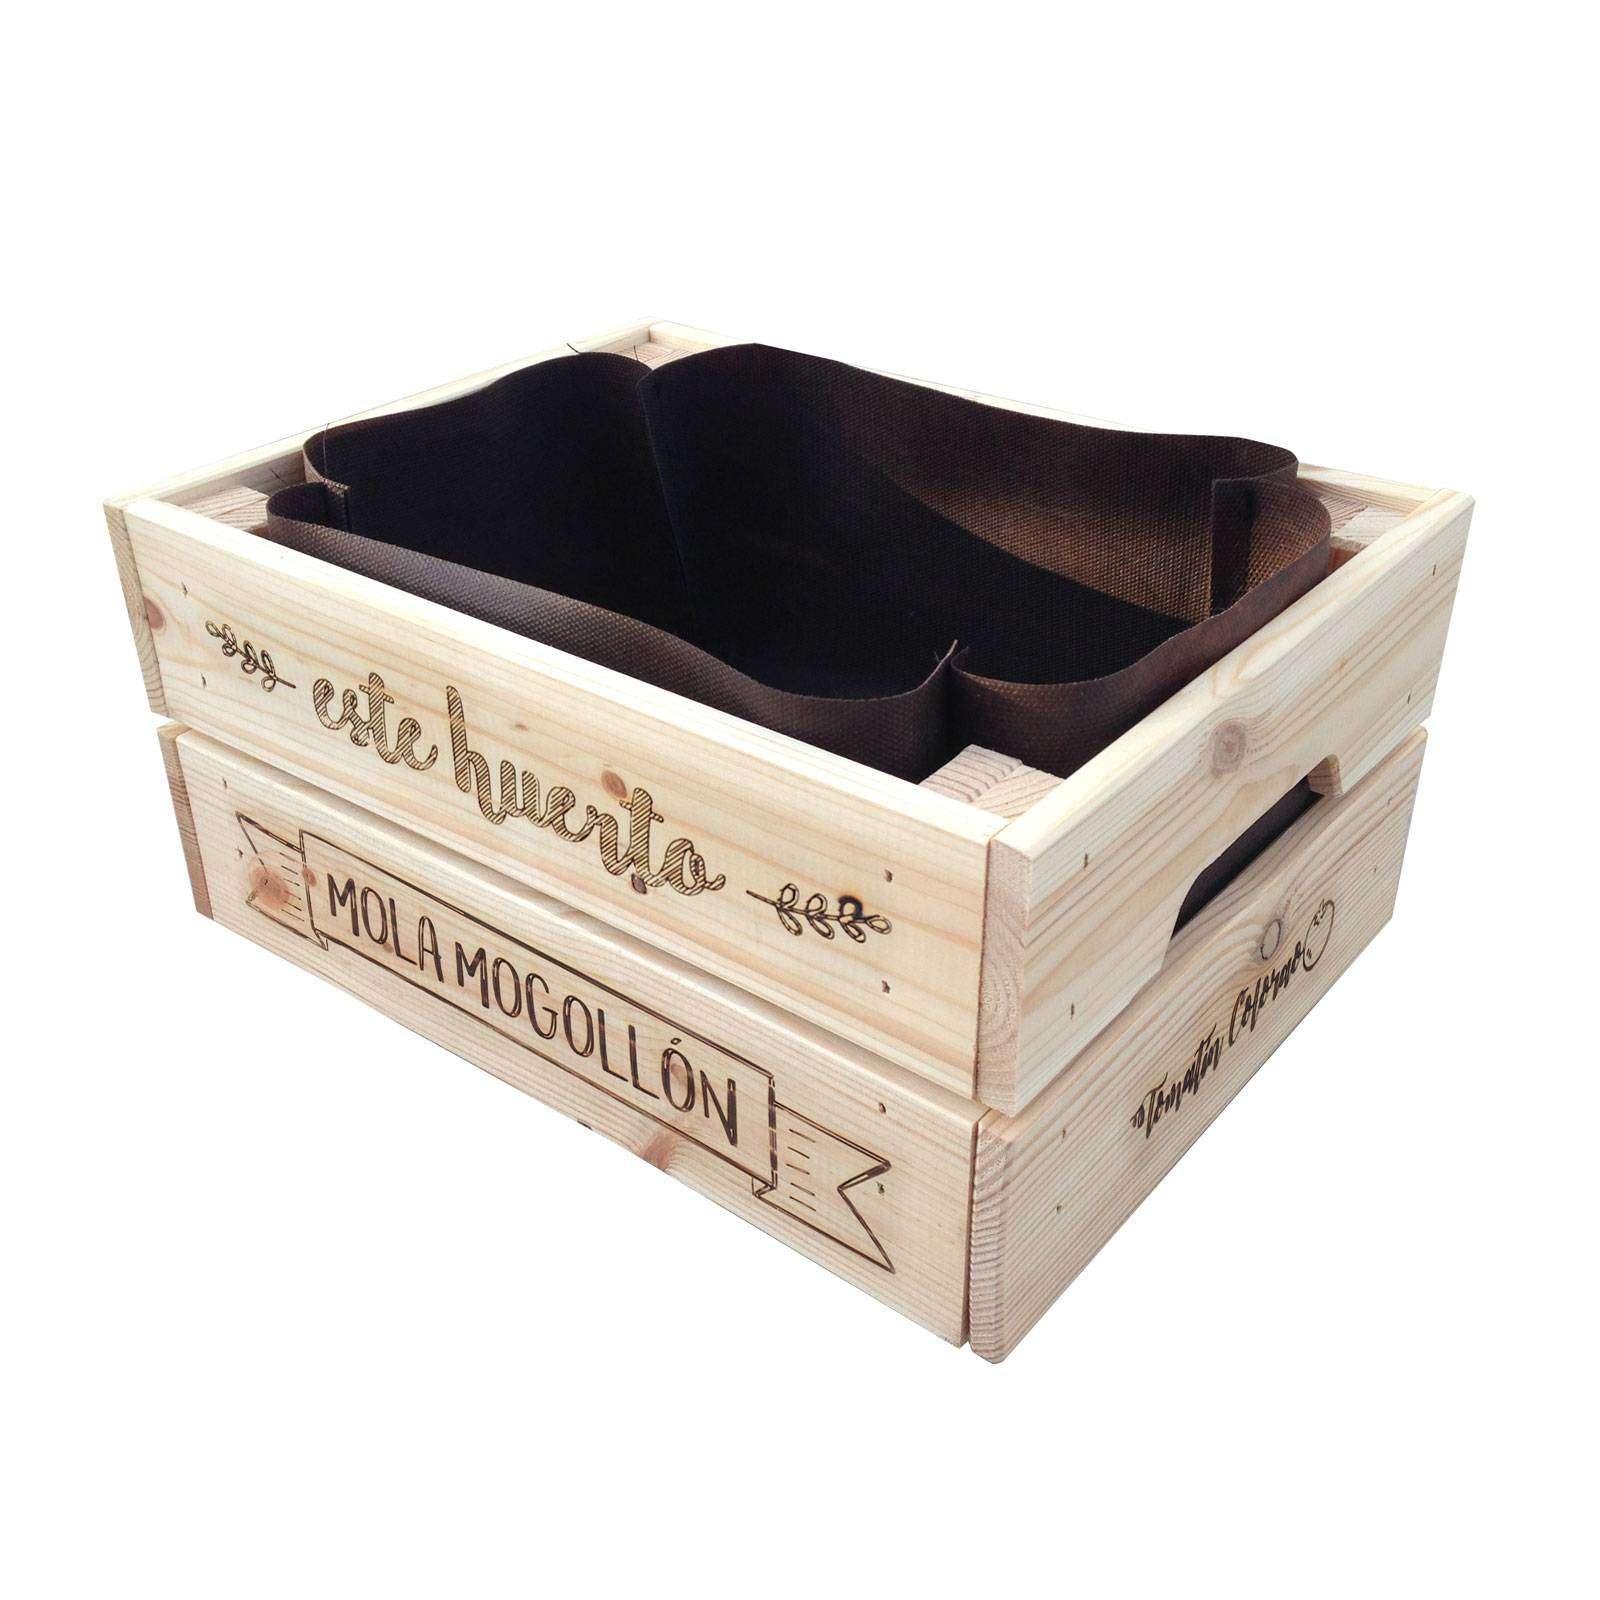 Donde comprar cajas de madera para fruta good ms with - Cajas de madera de fruta gratis ...